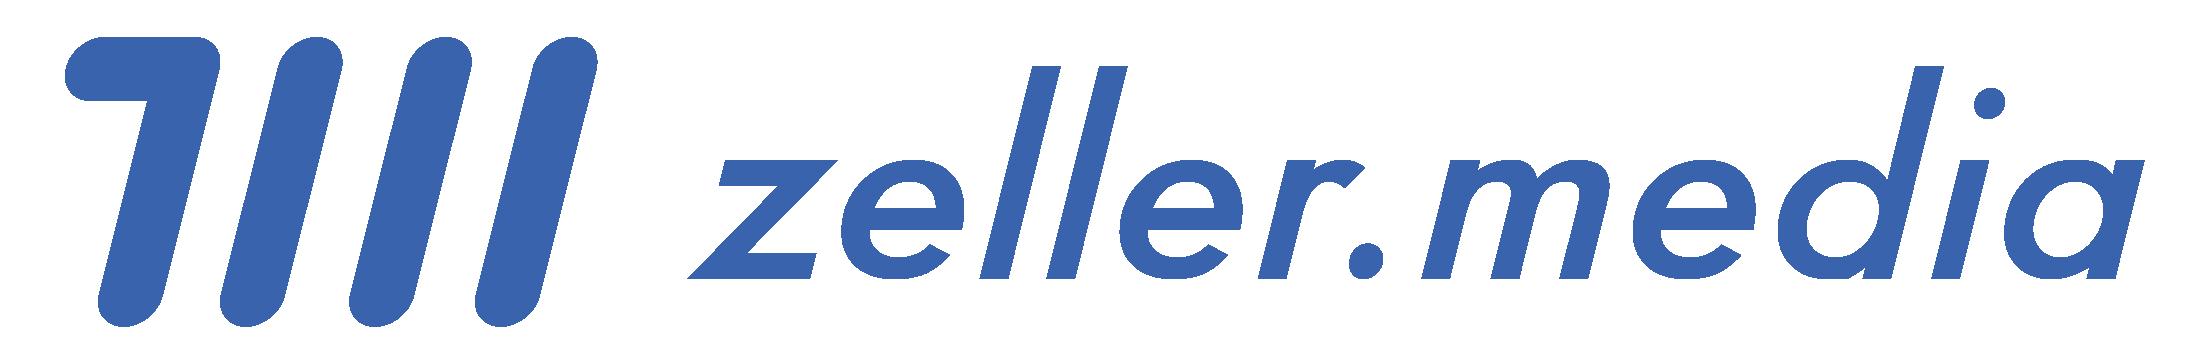 zeller-logo.png